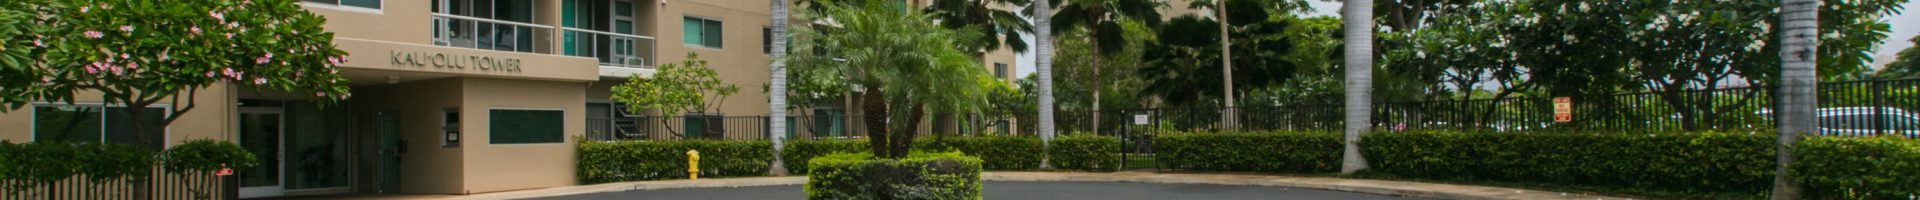 WAIPAHU | PLANTATION TOWN APARTMENTS